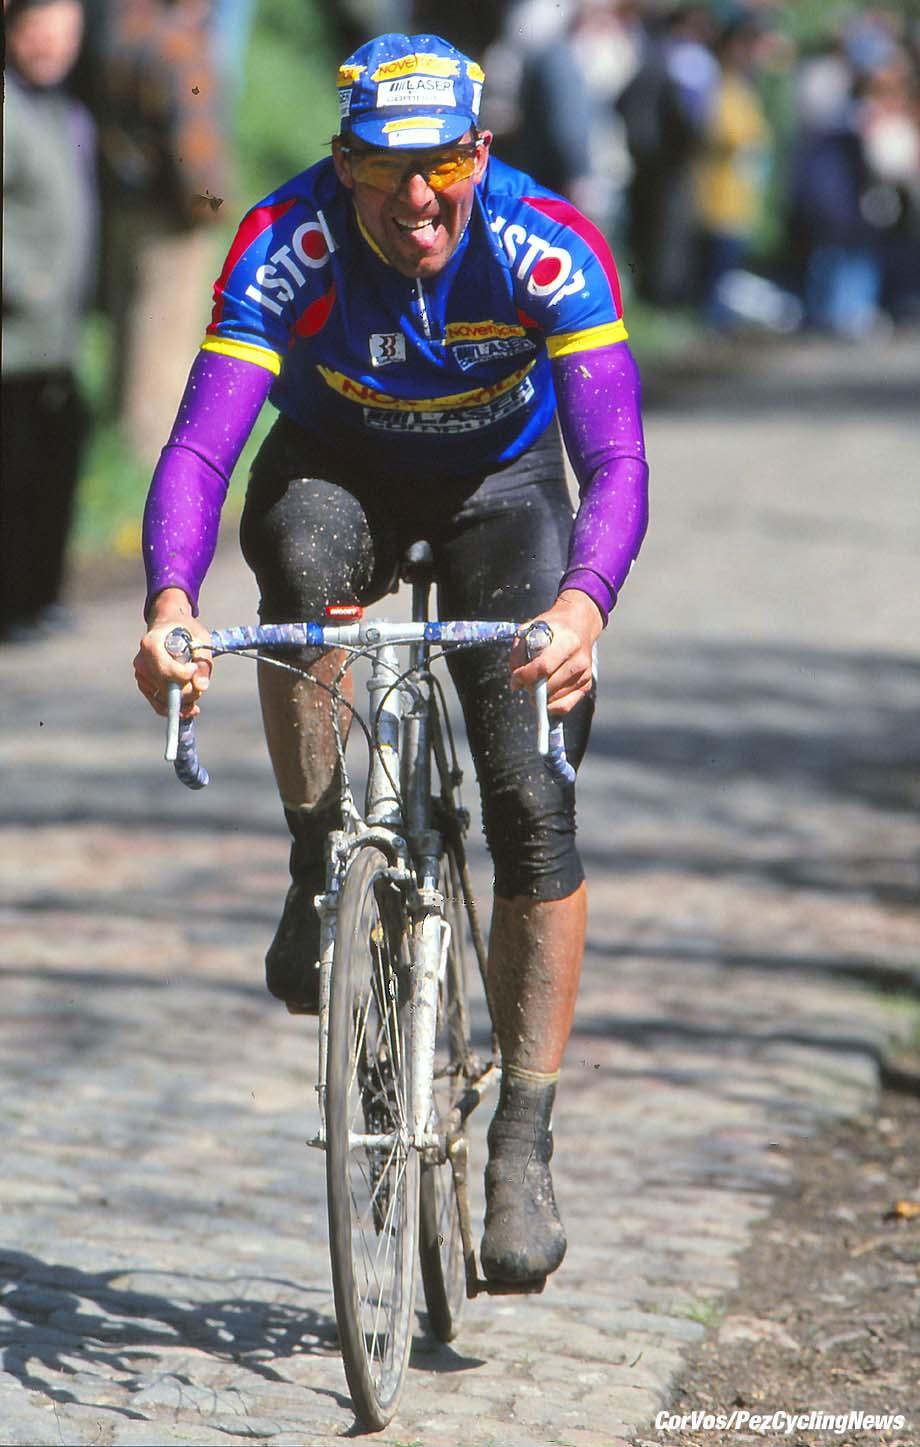 Roubaix - France  - wielrennen - cycling - cyclisme - radsport -   Dirk DE WOLF pictured during Paris-Roubaix 1994 - archief - stock - archive - archivbild -  photo Cor Vos © 2017